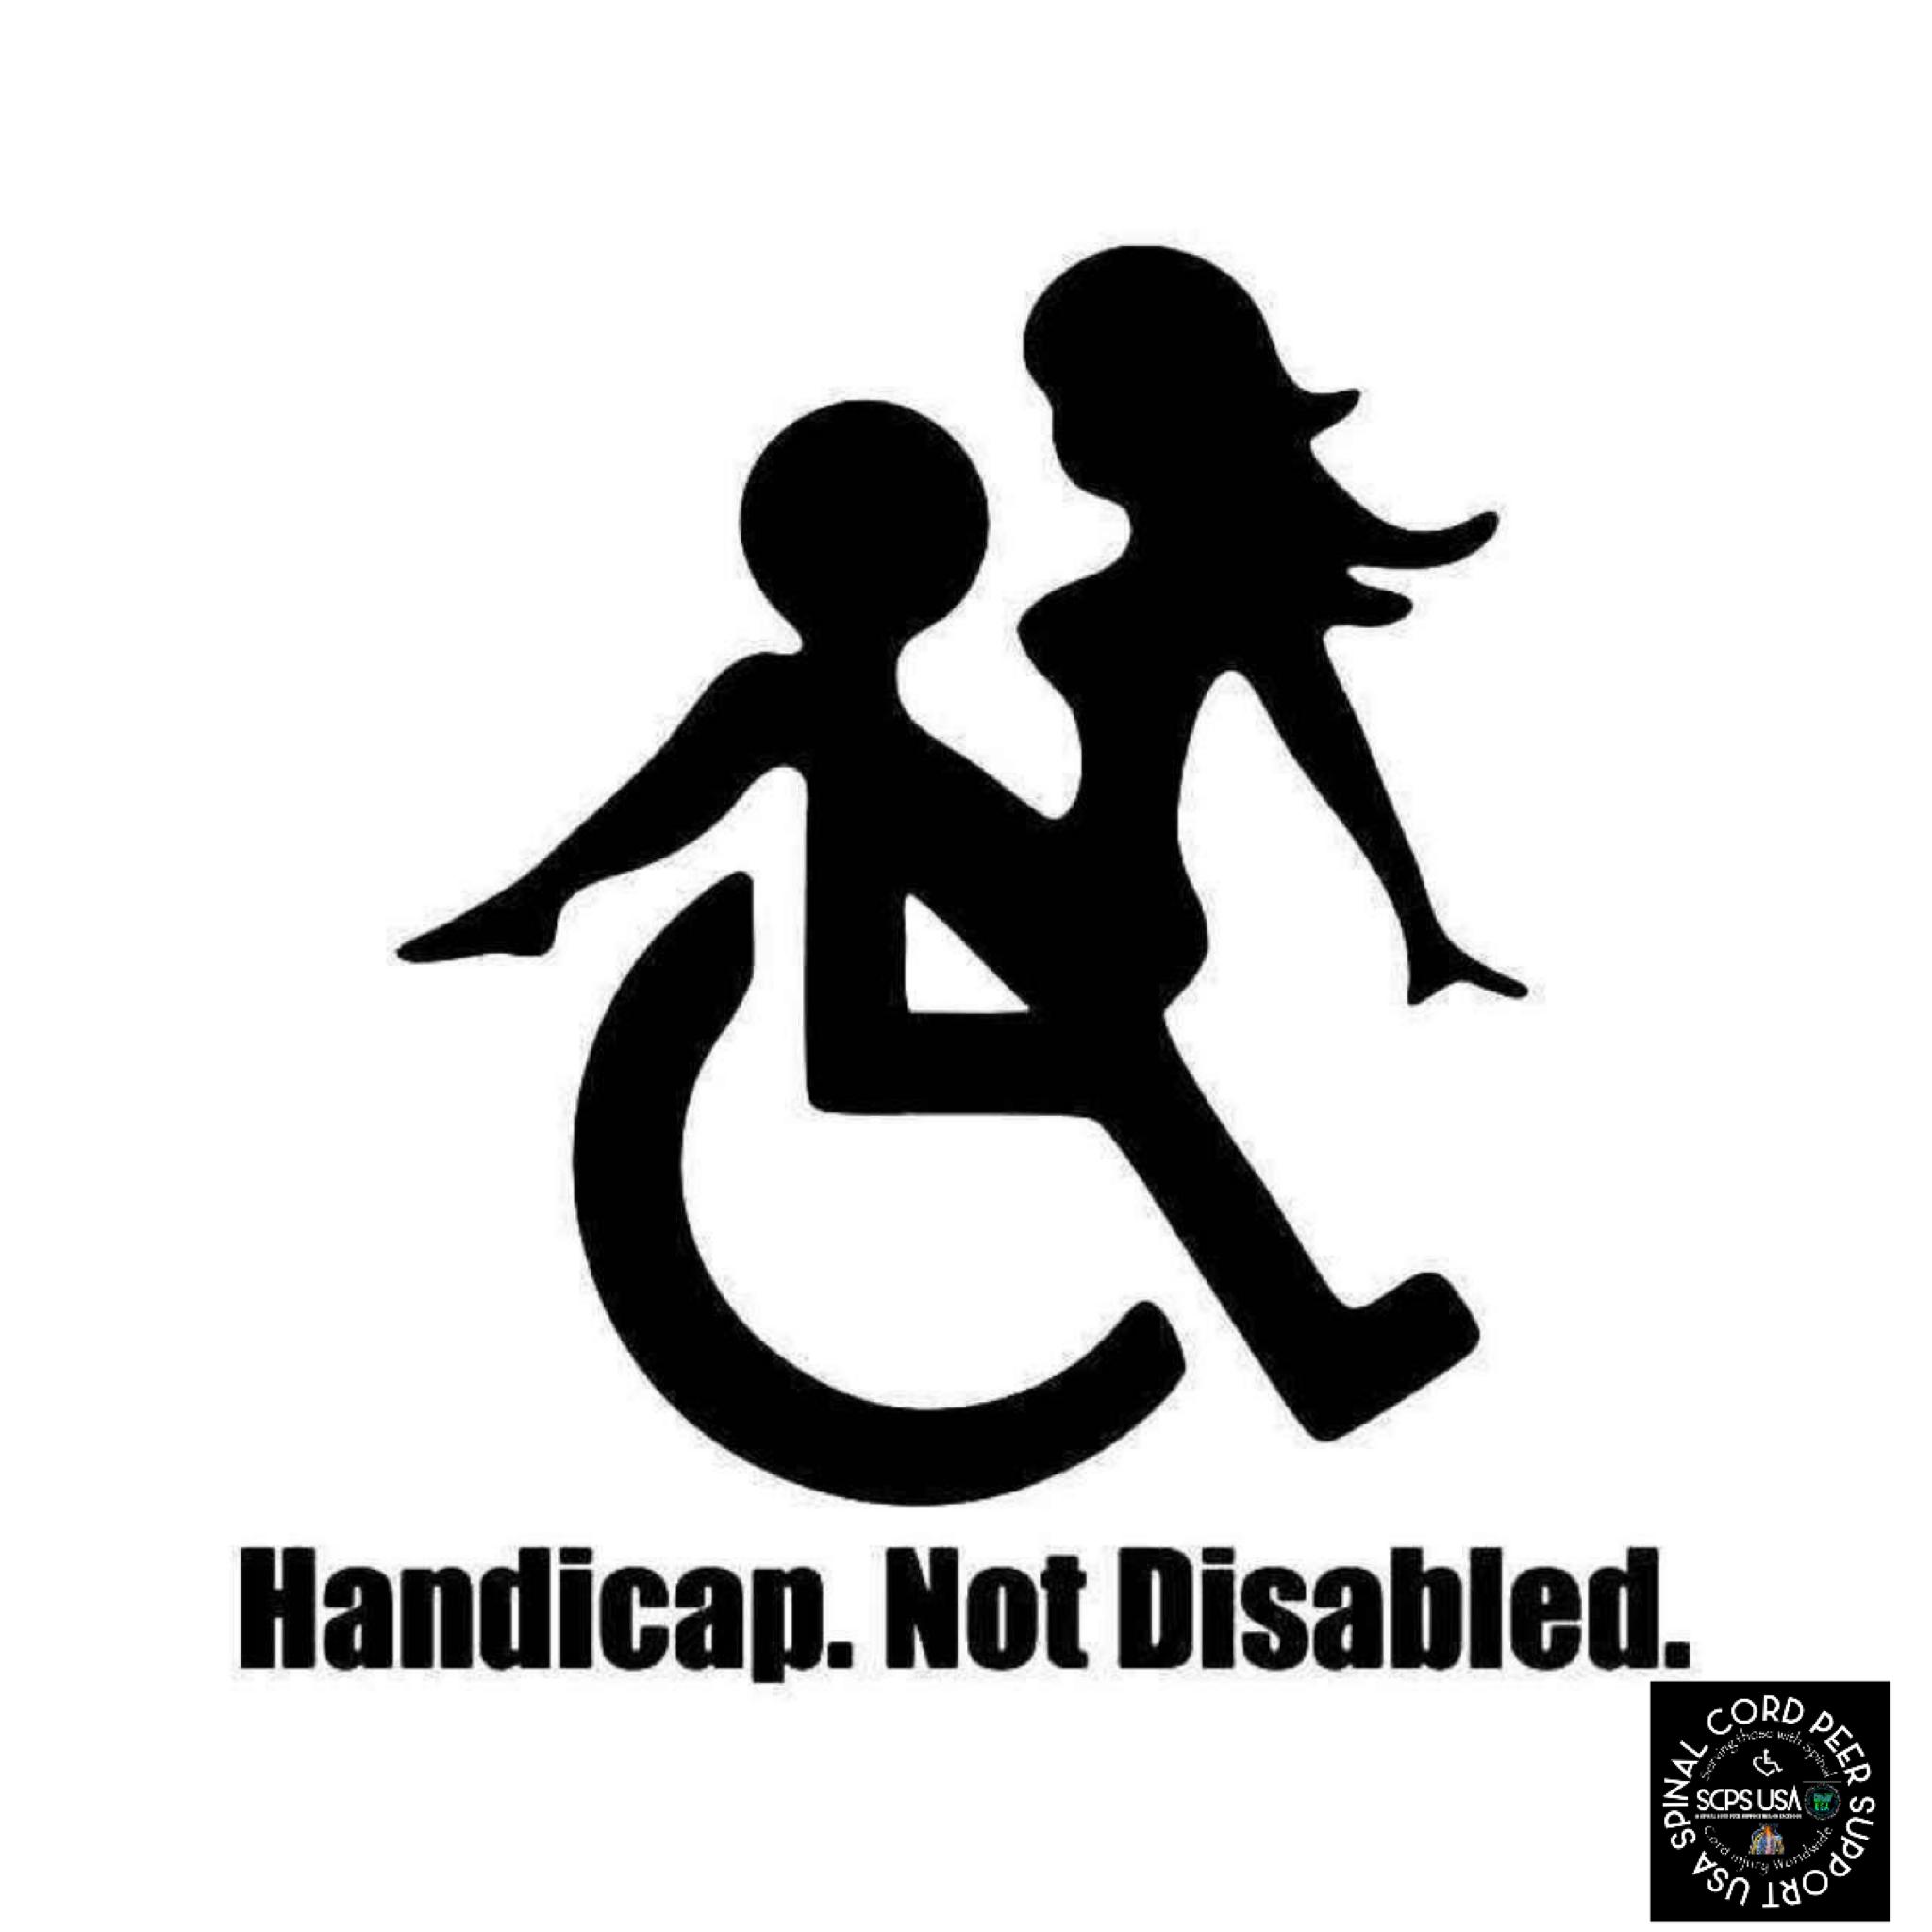 Art Disability Symbols Funny Vinyl Decals Vinyl Decal Stickers Vinyl [ 2048 x 2048 Pixel ]